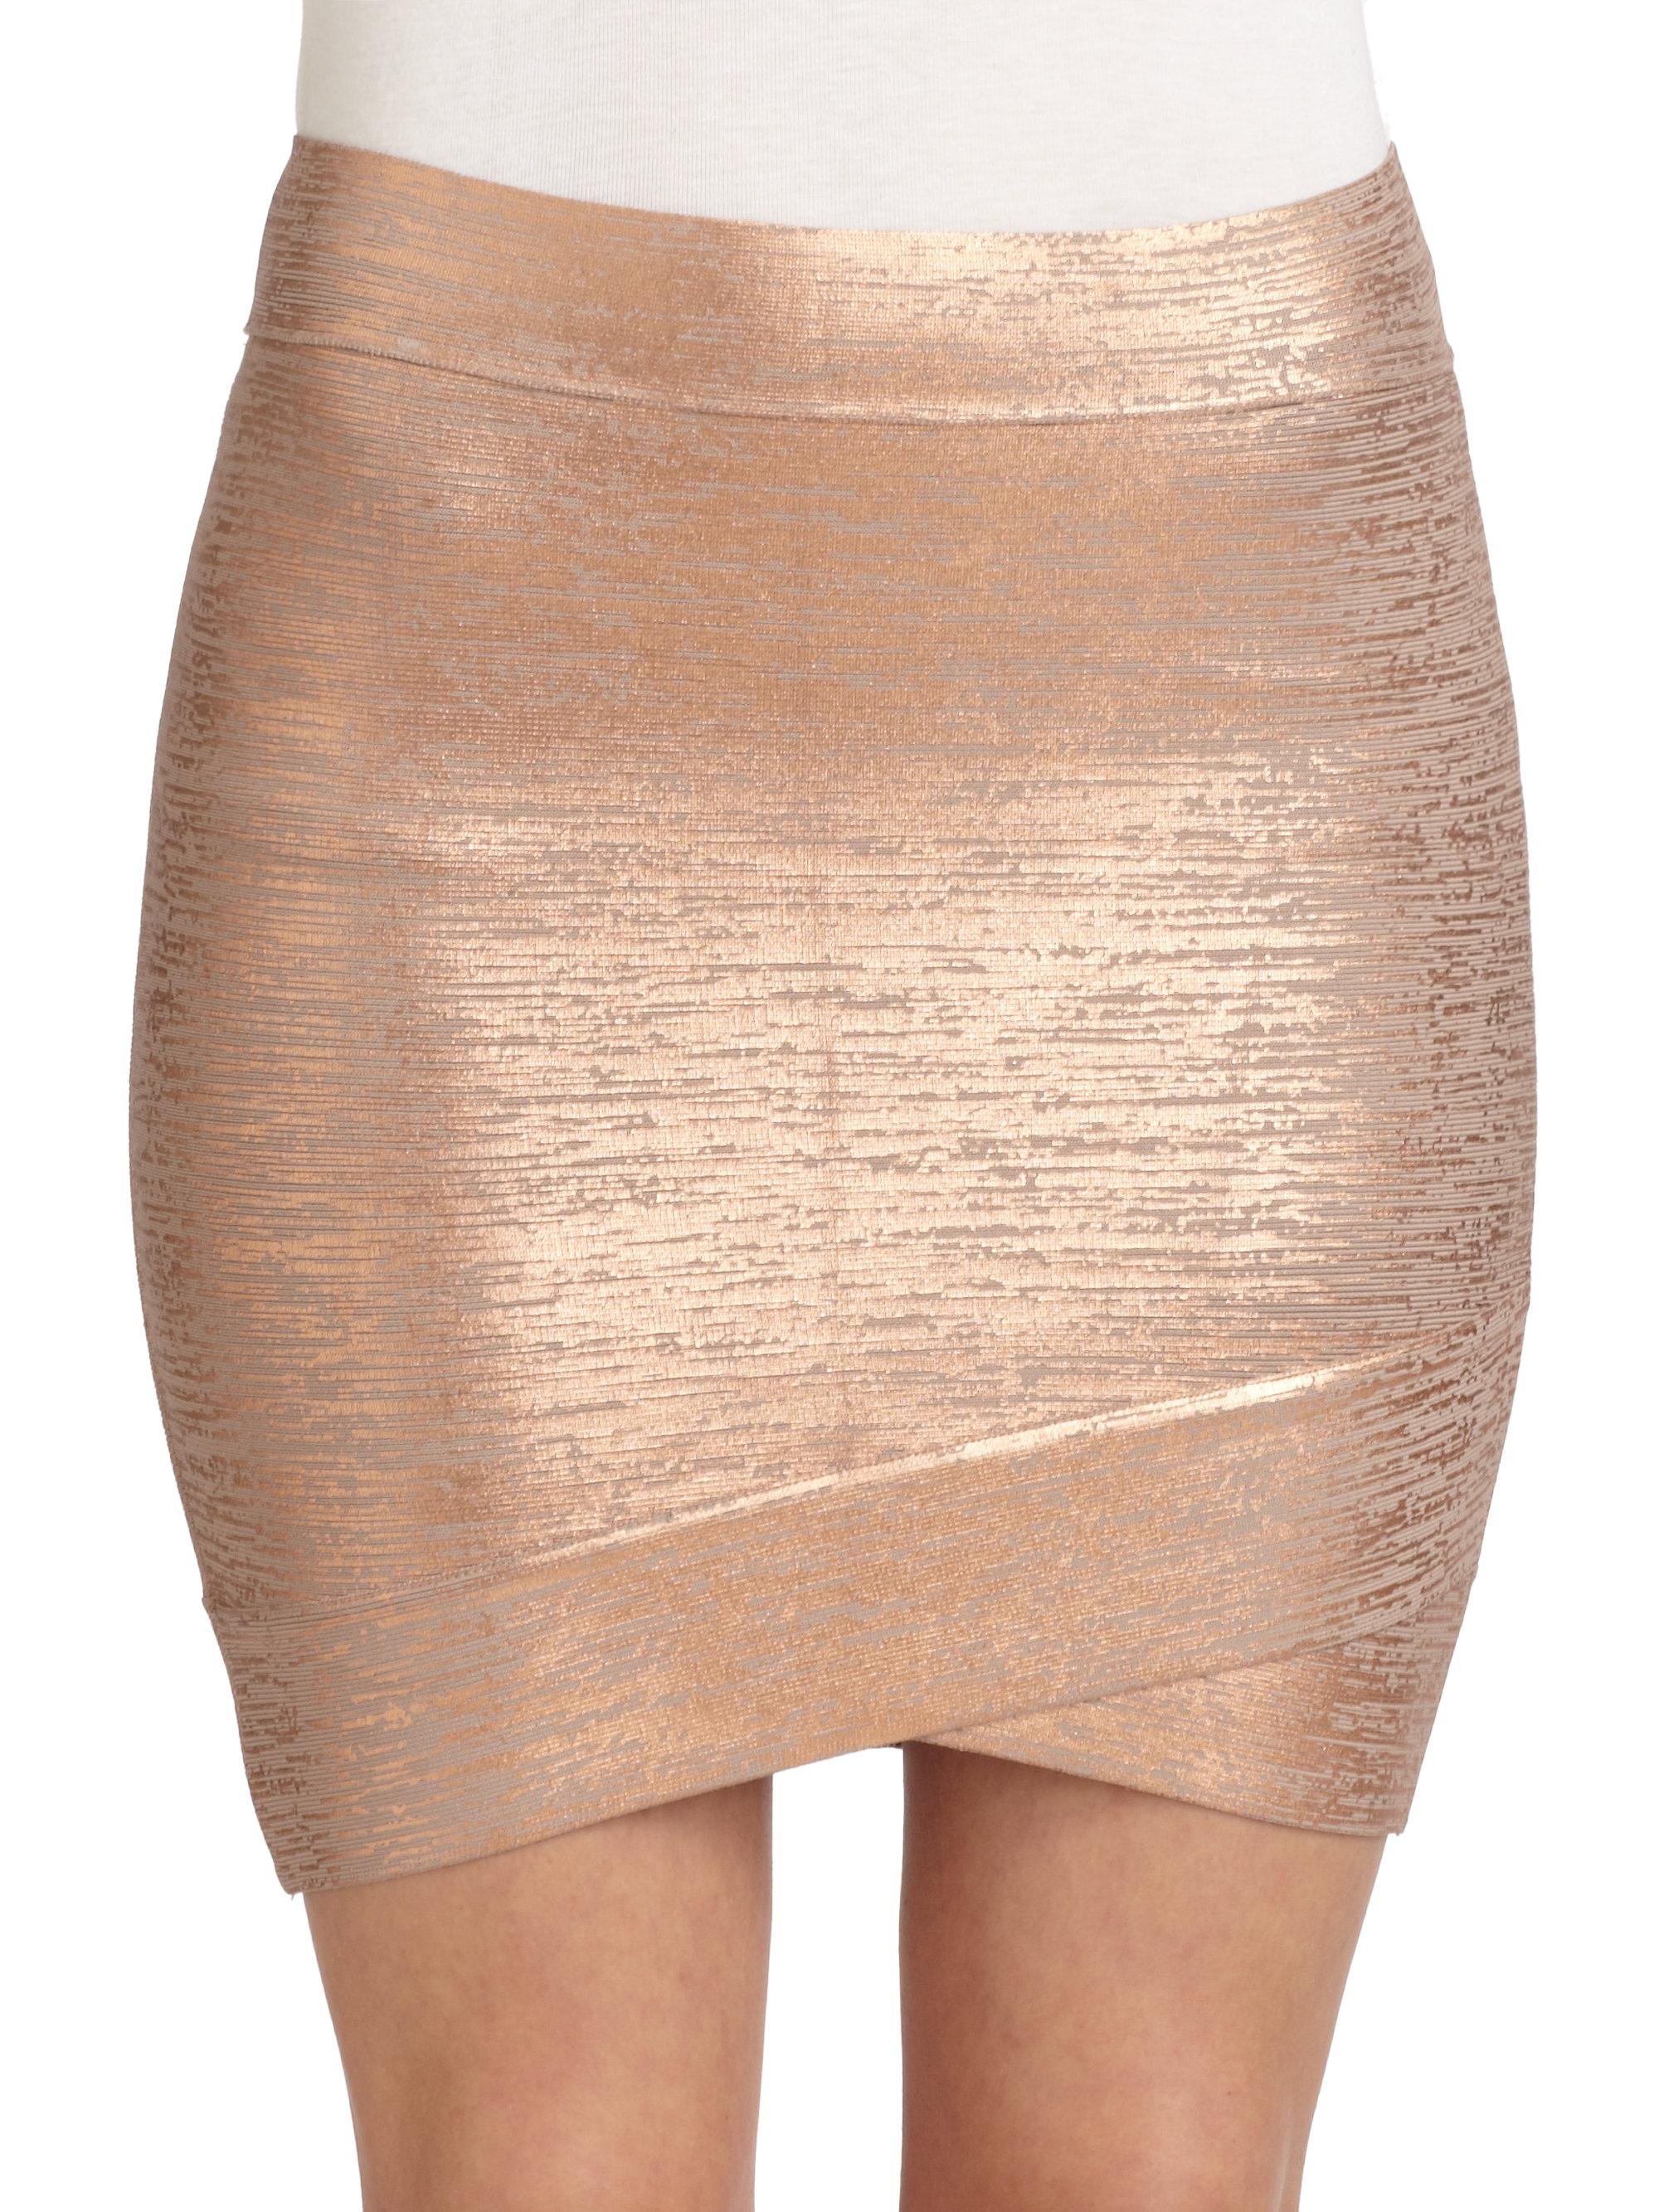 1ca7bb638 BCBGMAXAZRIA Silvie Foil Print Bandage Skirt in Metallic - Lyst